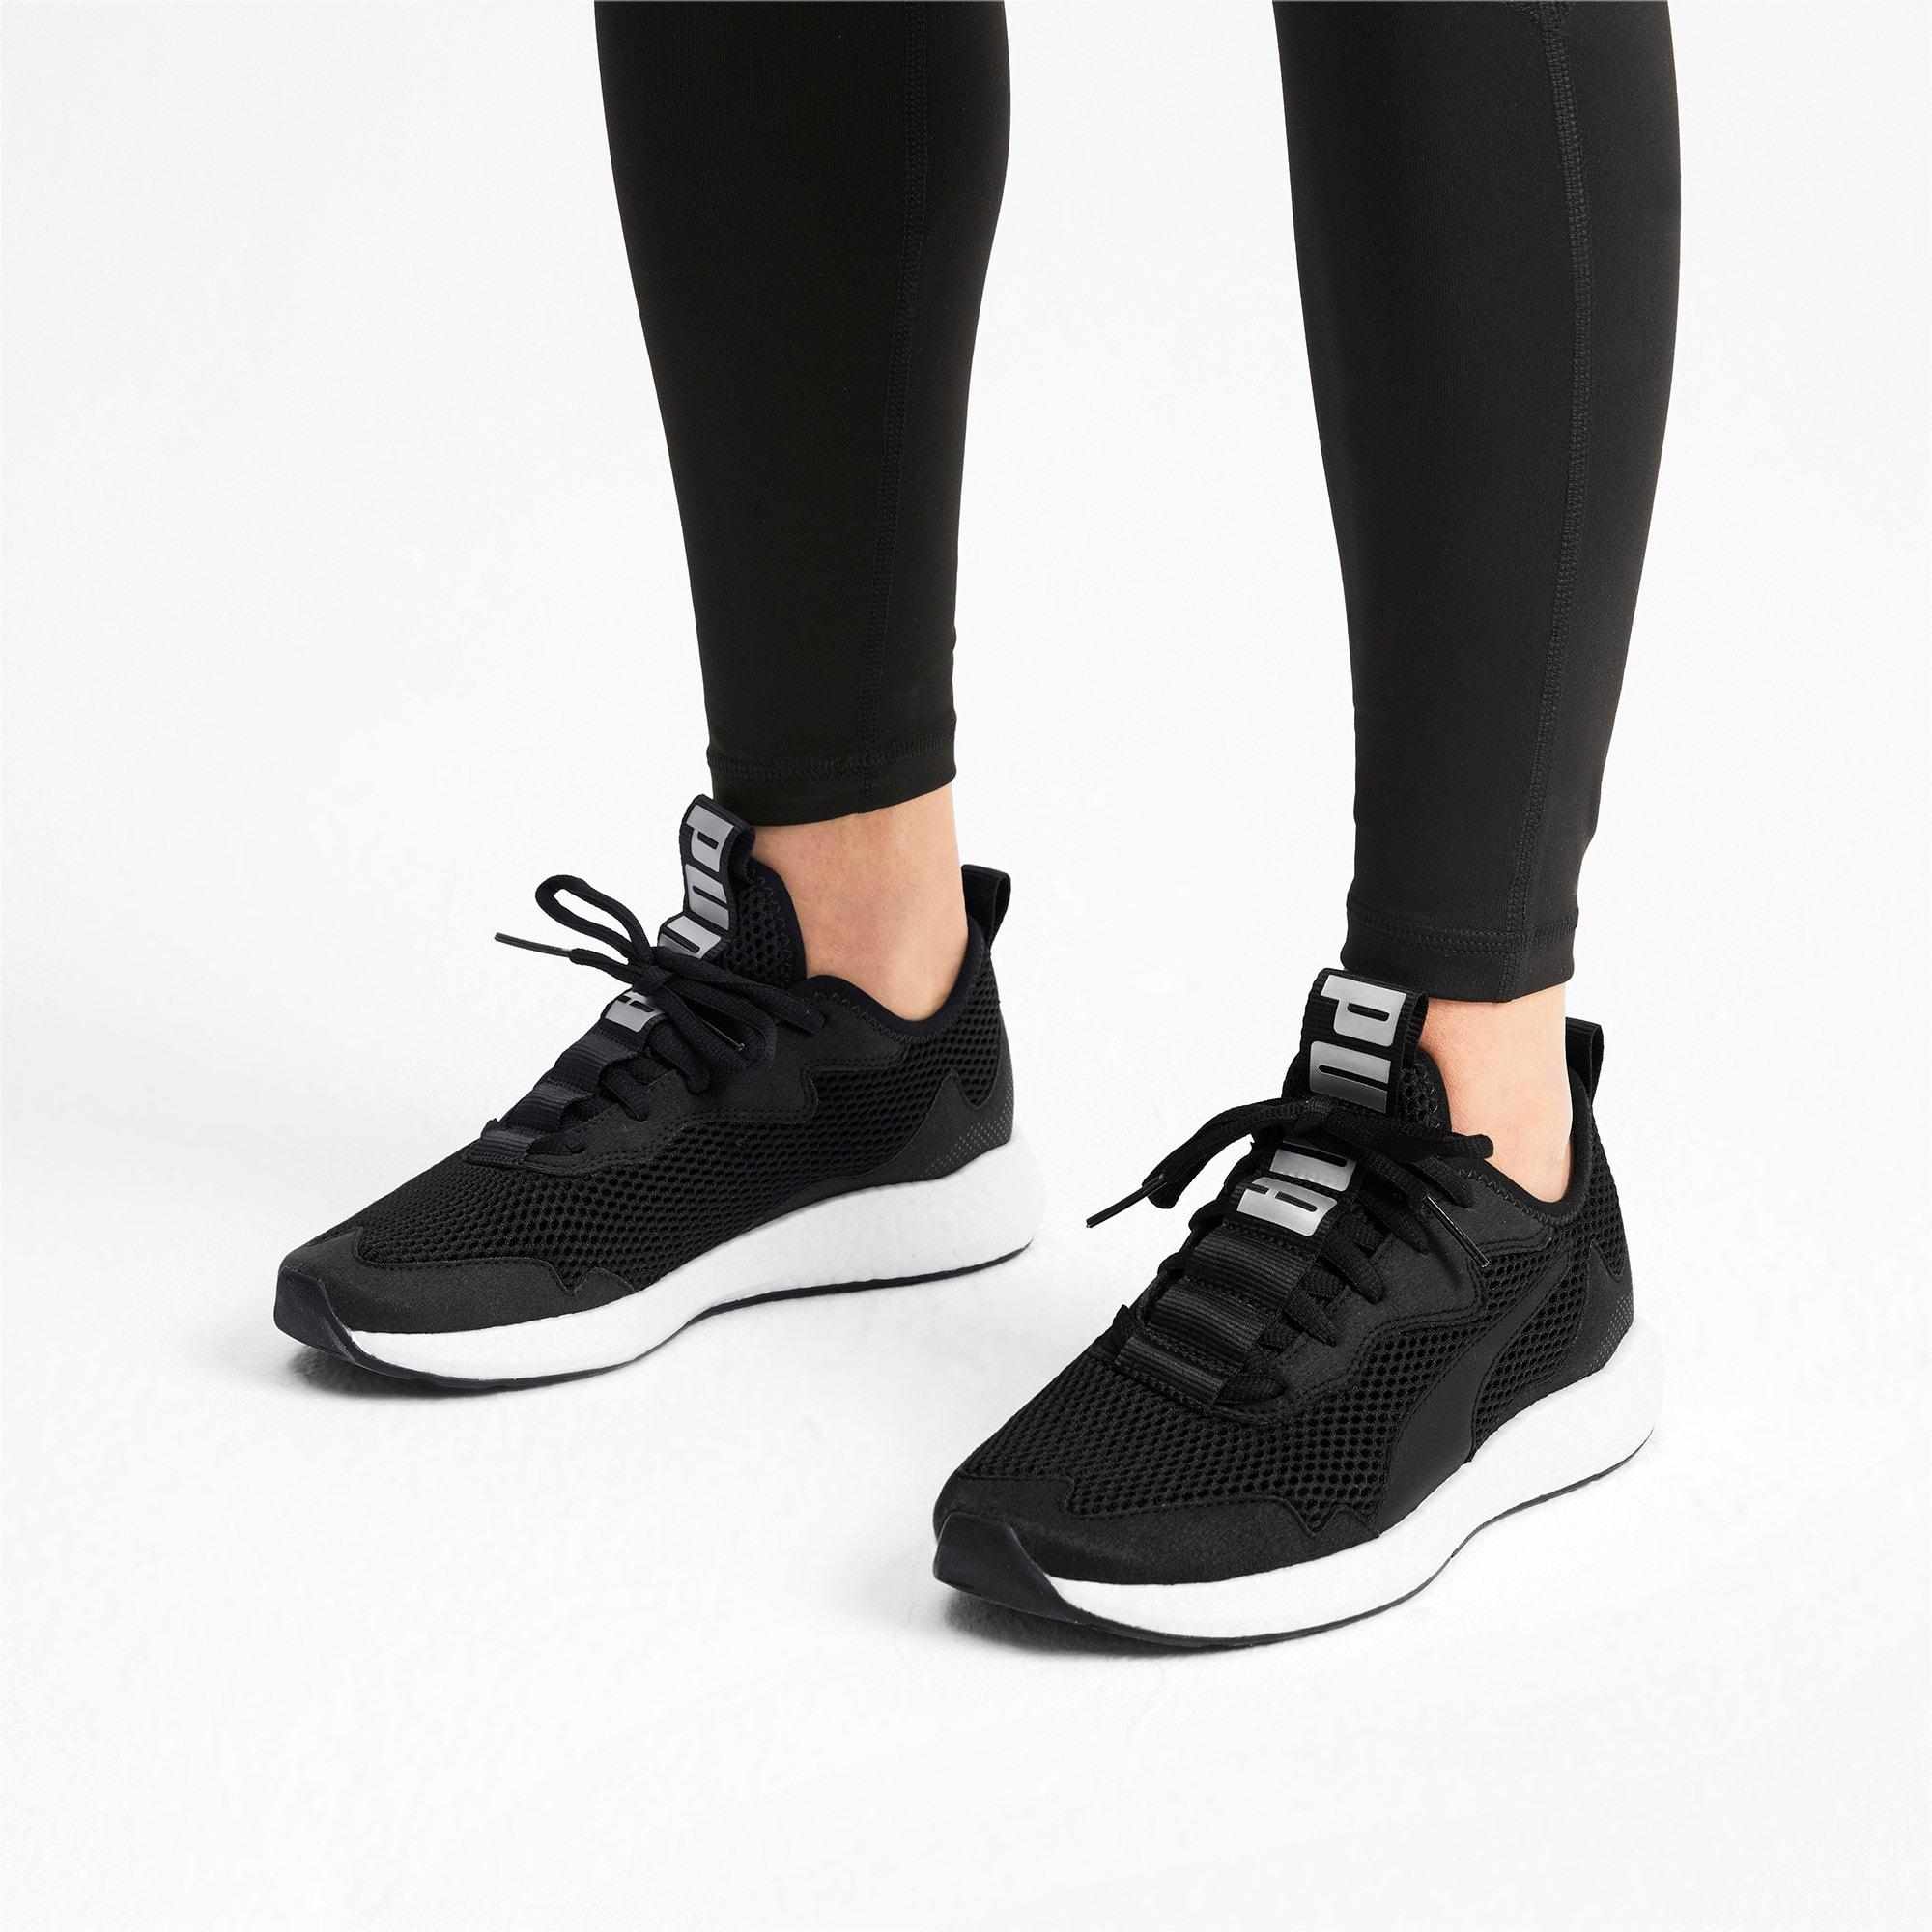 Thumbnail 2 of NRGY Neko Skim Women's Running Shoes, Puma Black-Puma Silver, medium-IND